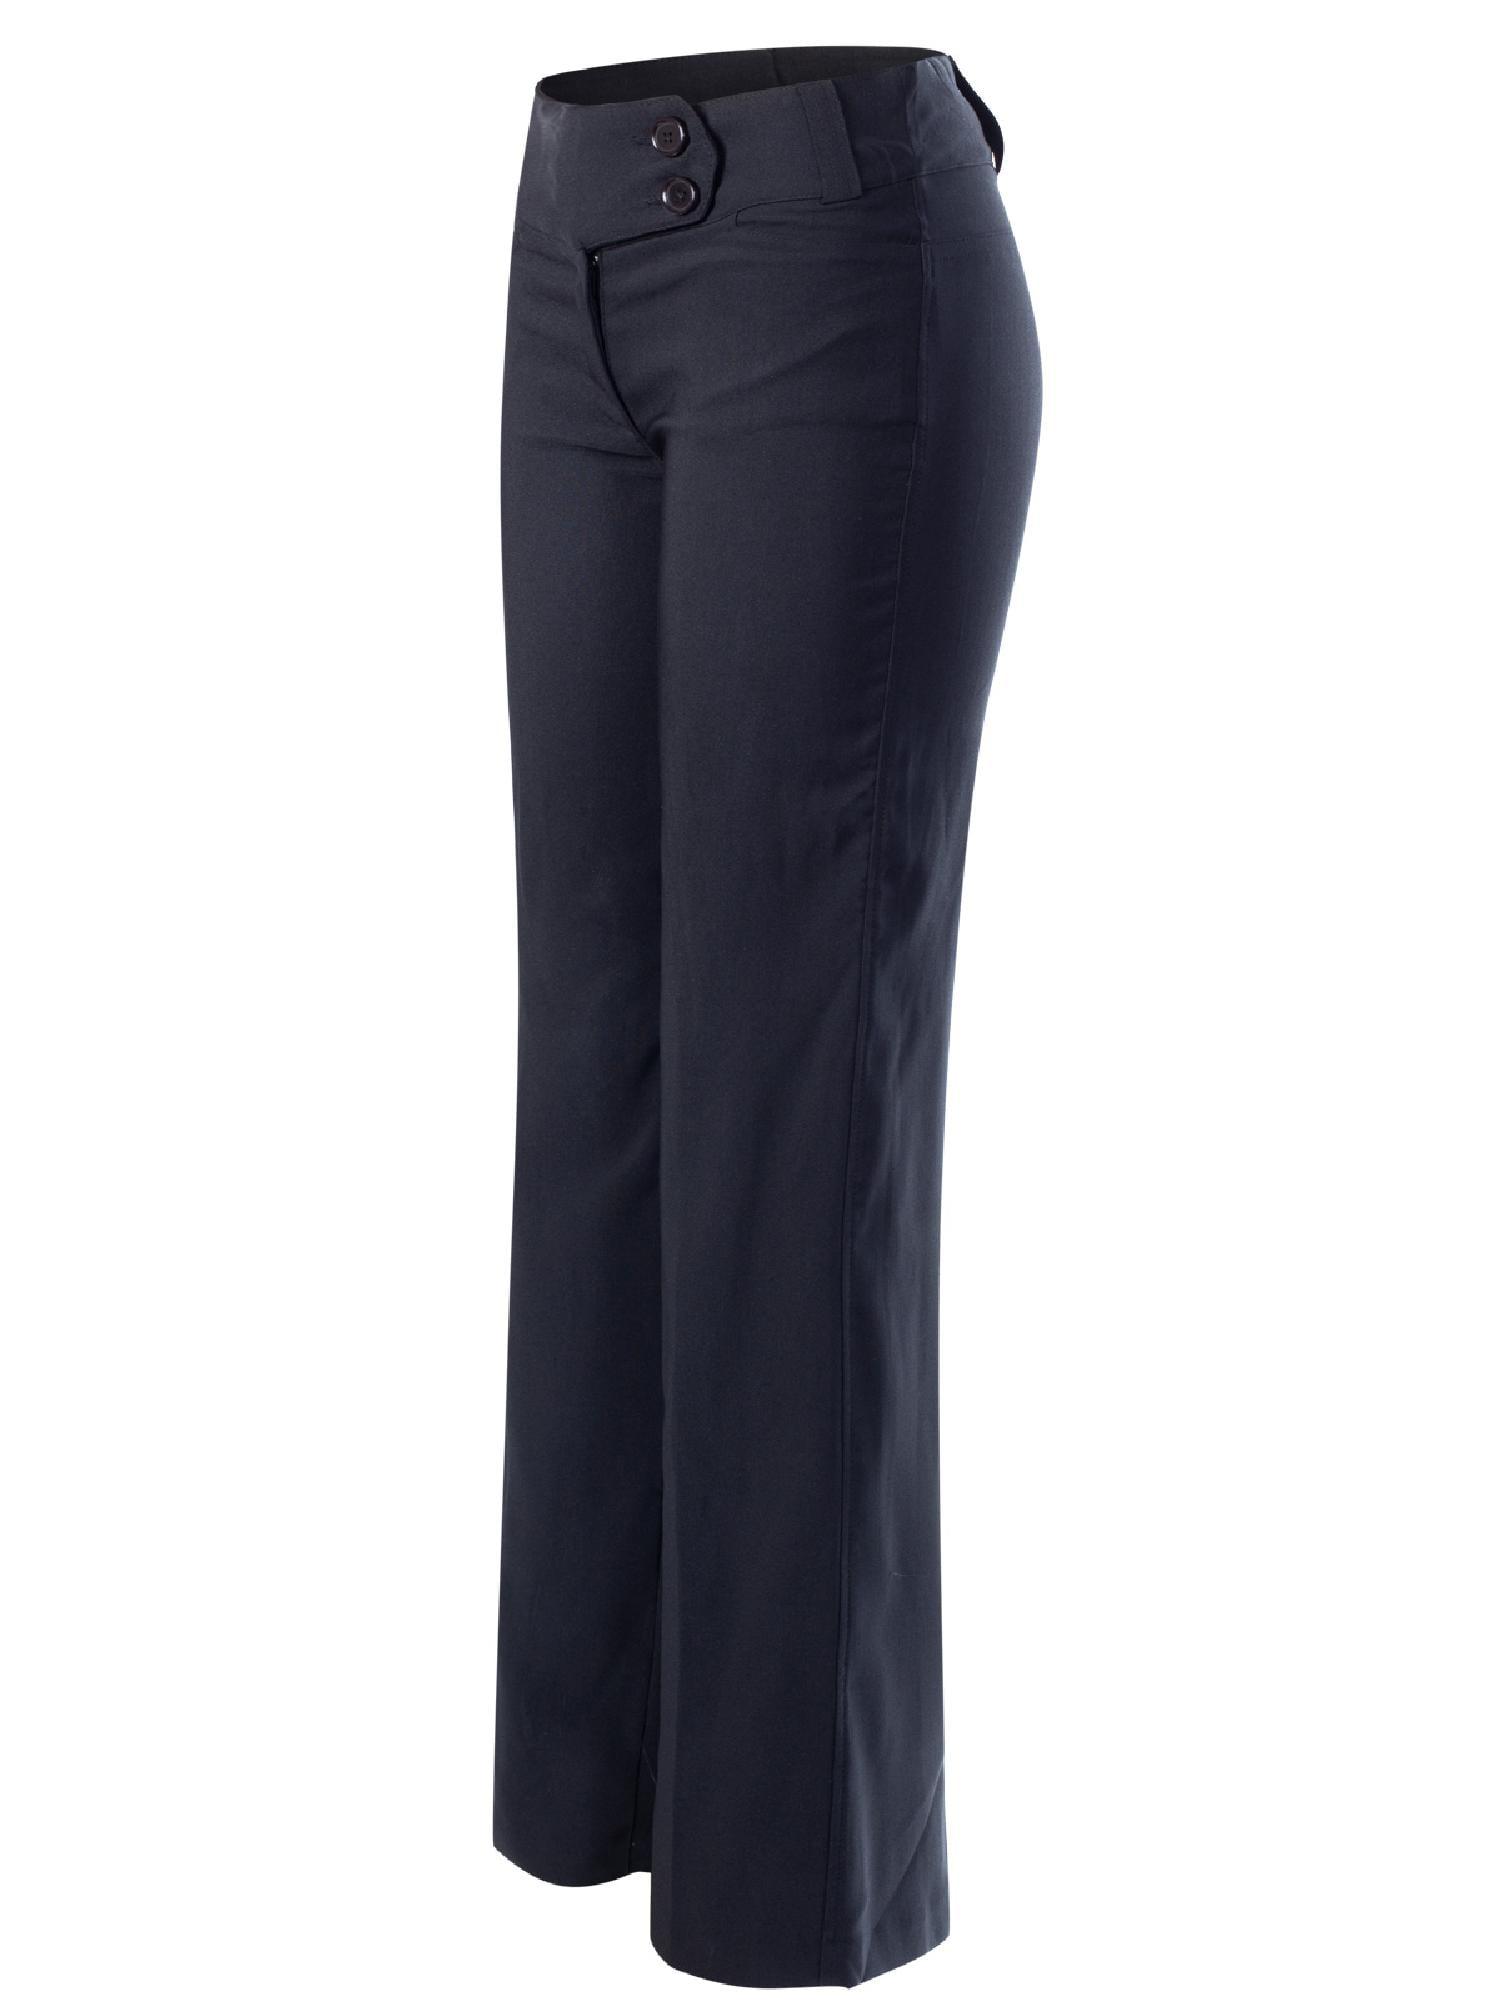 19dd61814a Made by Olivia - Made by Olivia Women s High Waist Slim Boot-Cut Stretch  Dress Pants Trousers Black L - Walmart.com